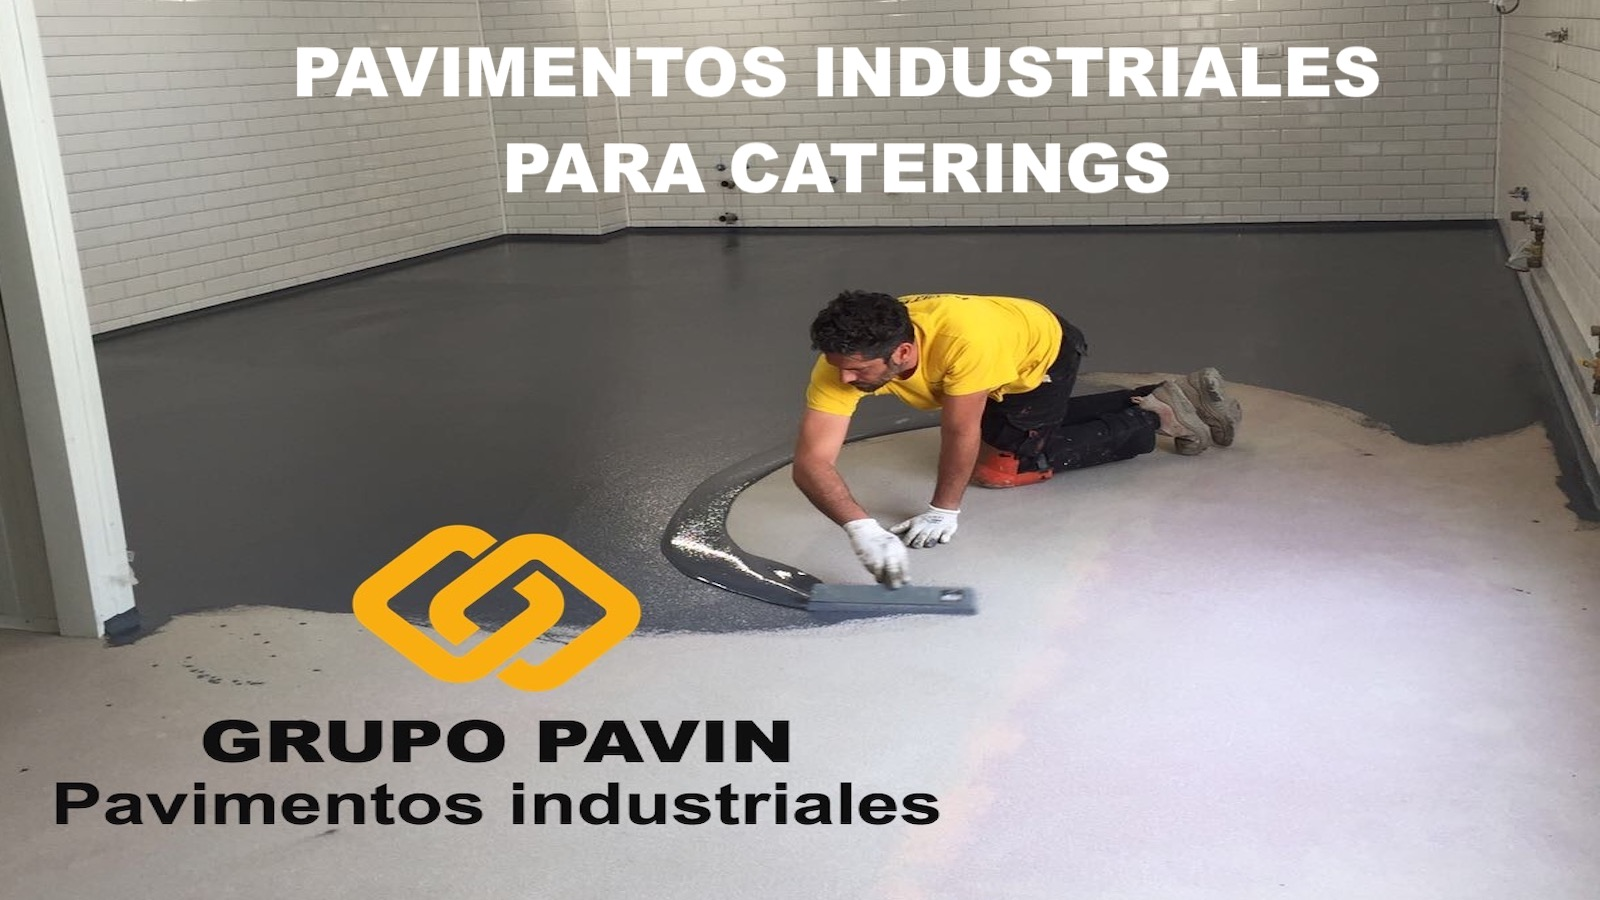 Pavimentos industriales para caterings